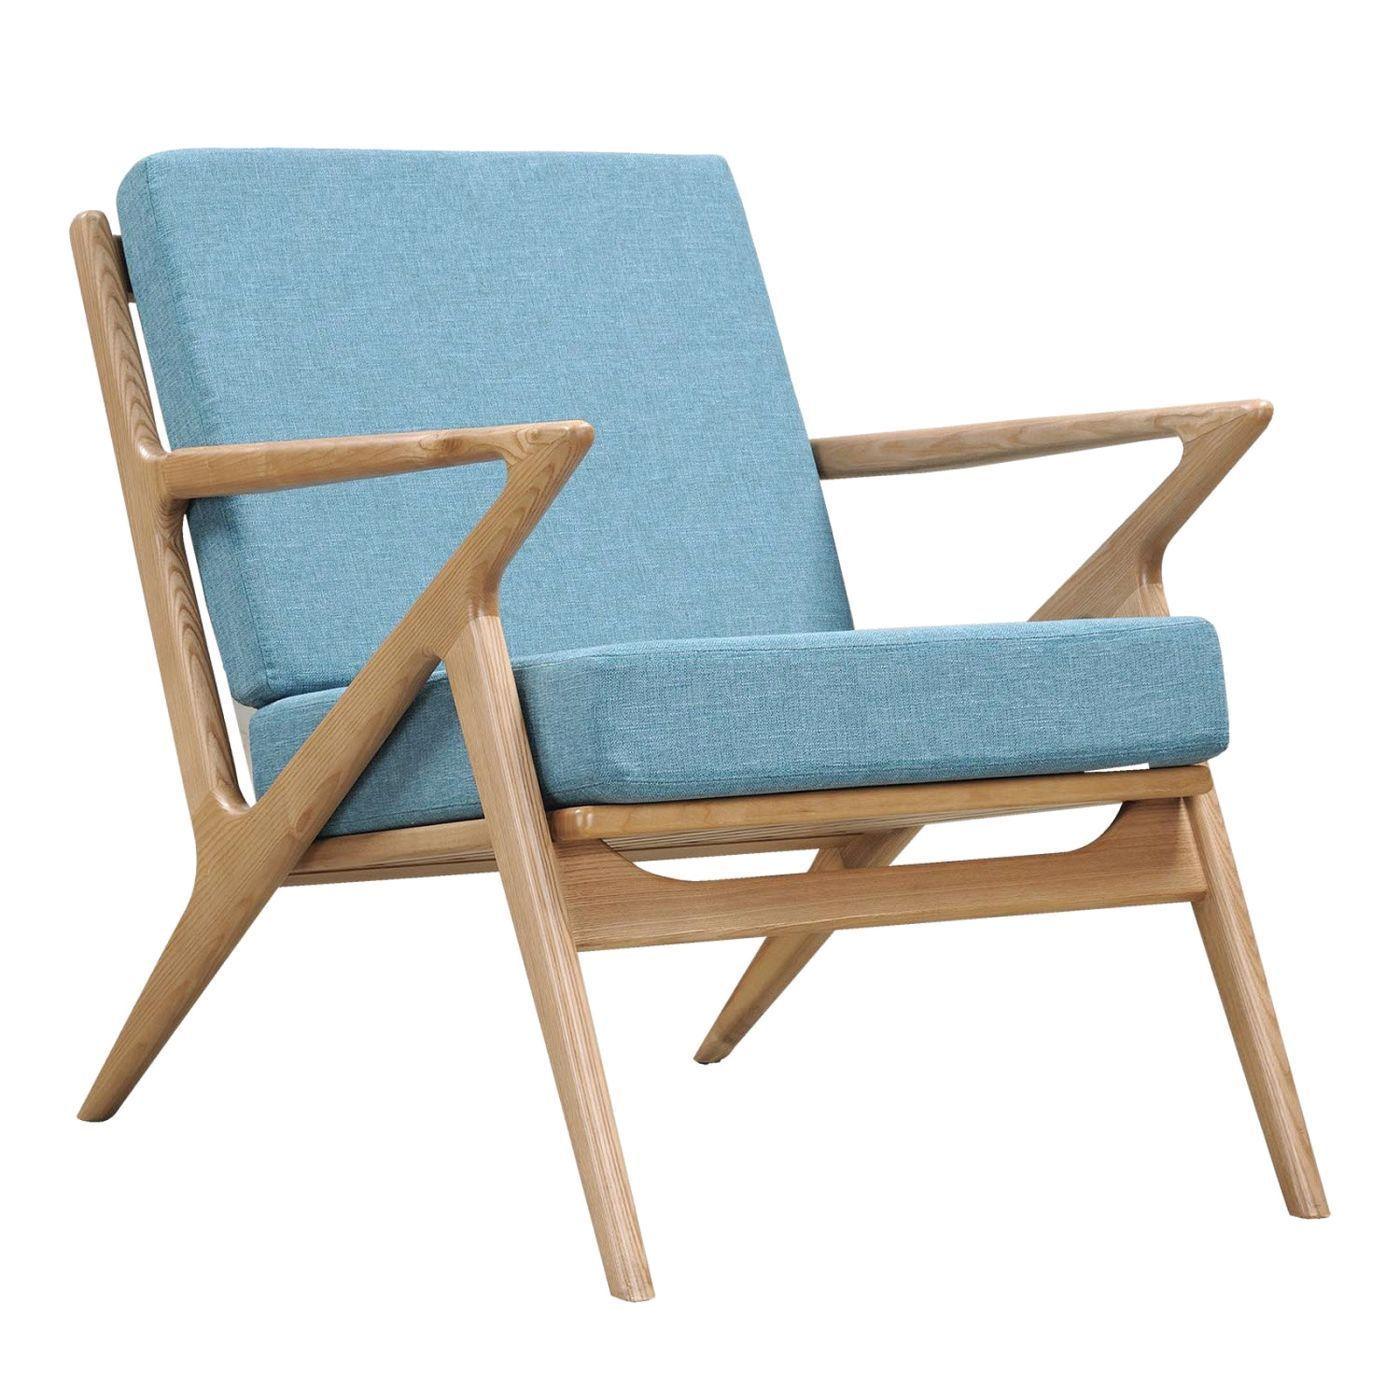 Zain Chair Dodger Blue Greychair Accent Chairs Under 100 White Bedroom Navy